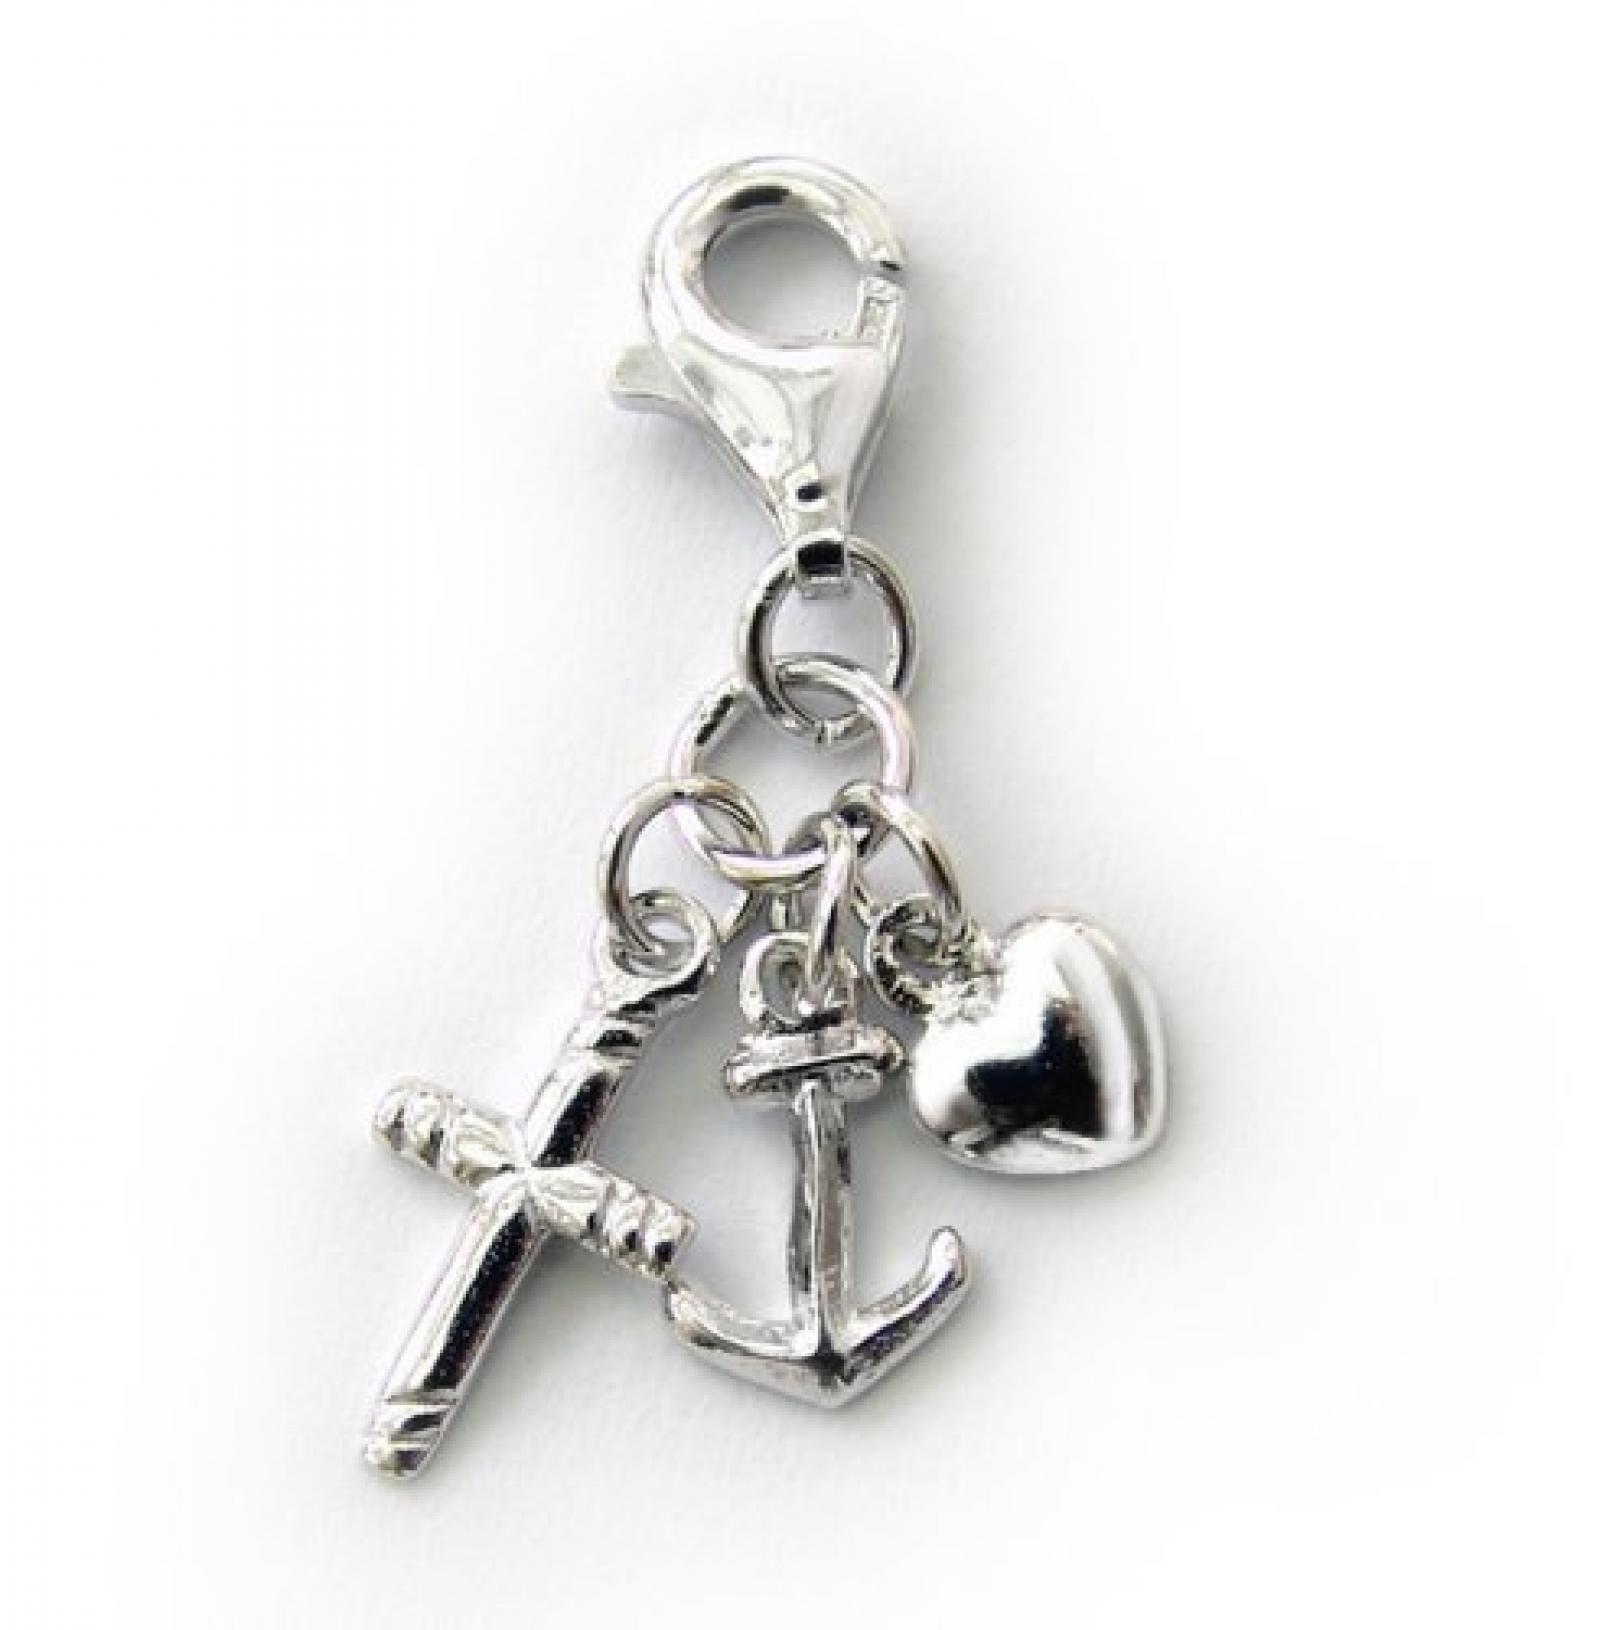 ZEEme Damen-Charm Glaube Liebe Hoffnung 925 Sterling-Silber 141240100R